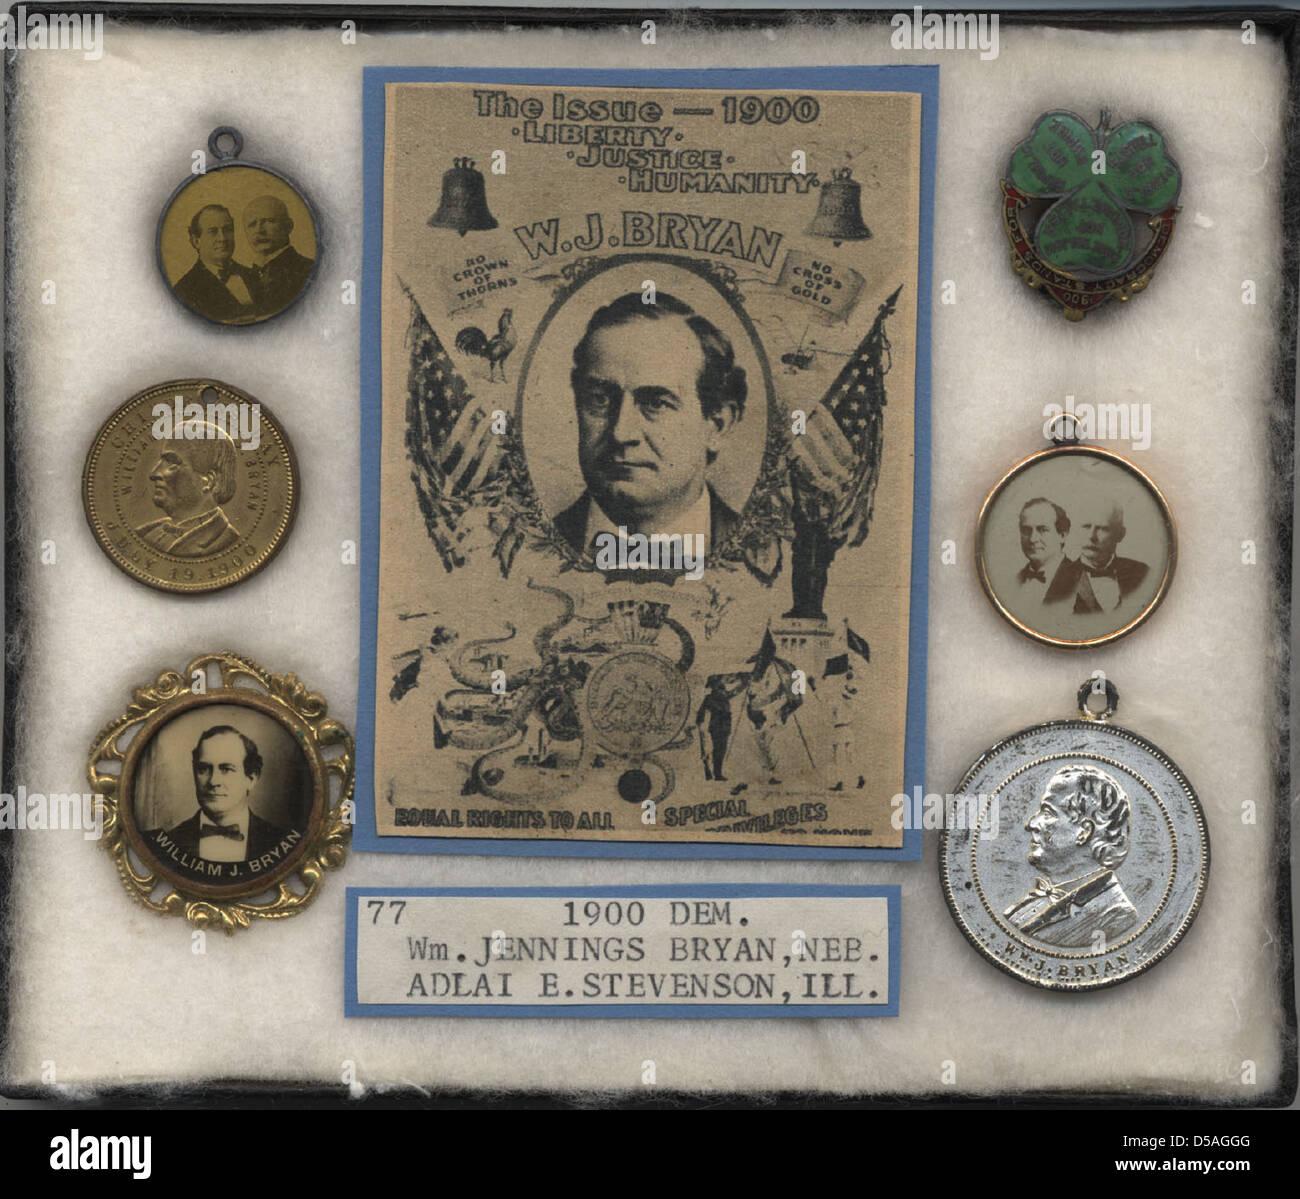 Bryan-Stevenson Campaign Items, ca. 1900 - Stock Image